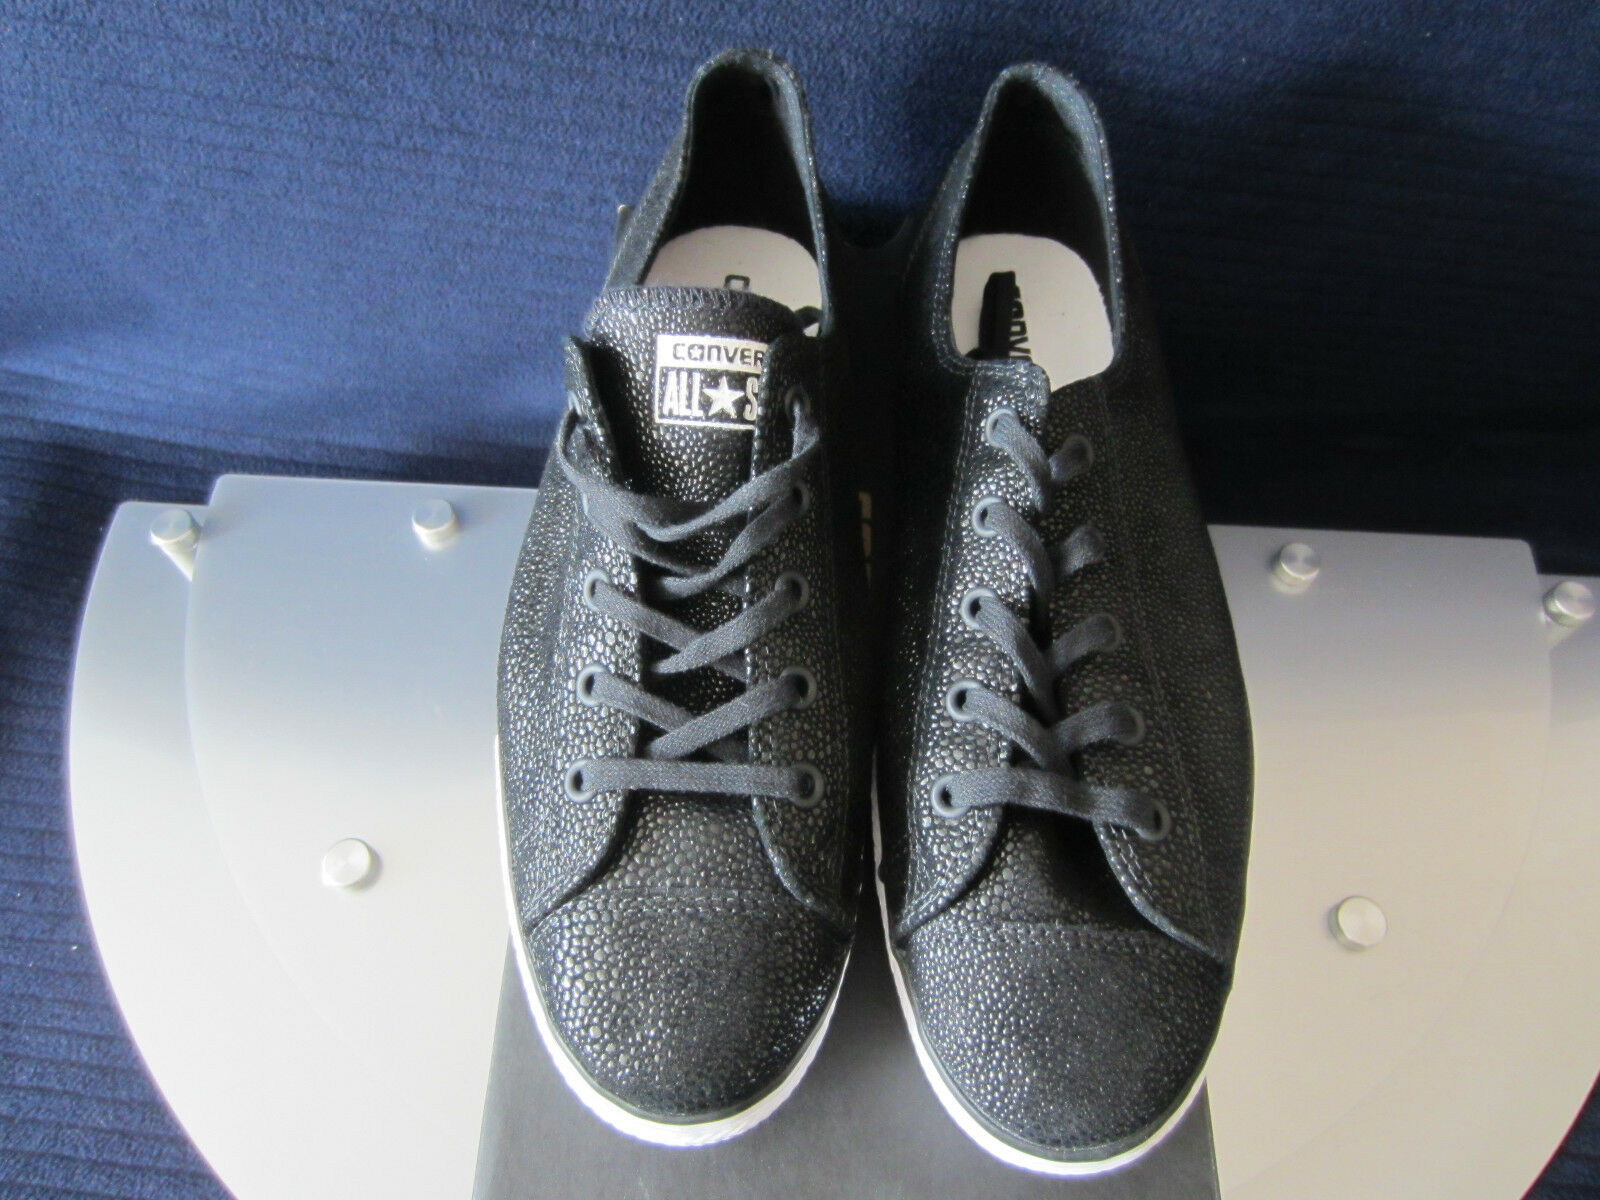 CONVERSE Schwarz Chuck Taylor All Star 553334C Sneakers Schwarz CONVERSE Gr.40, 42, 43. NEU 7edf4b